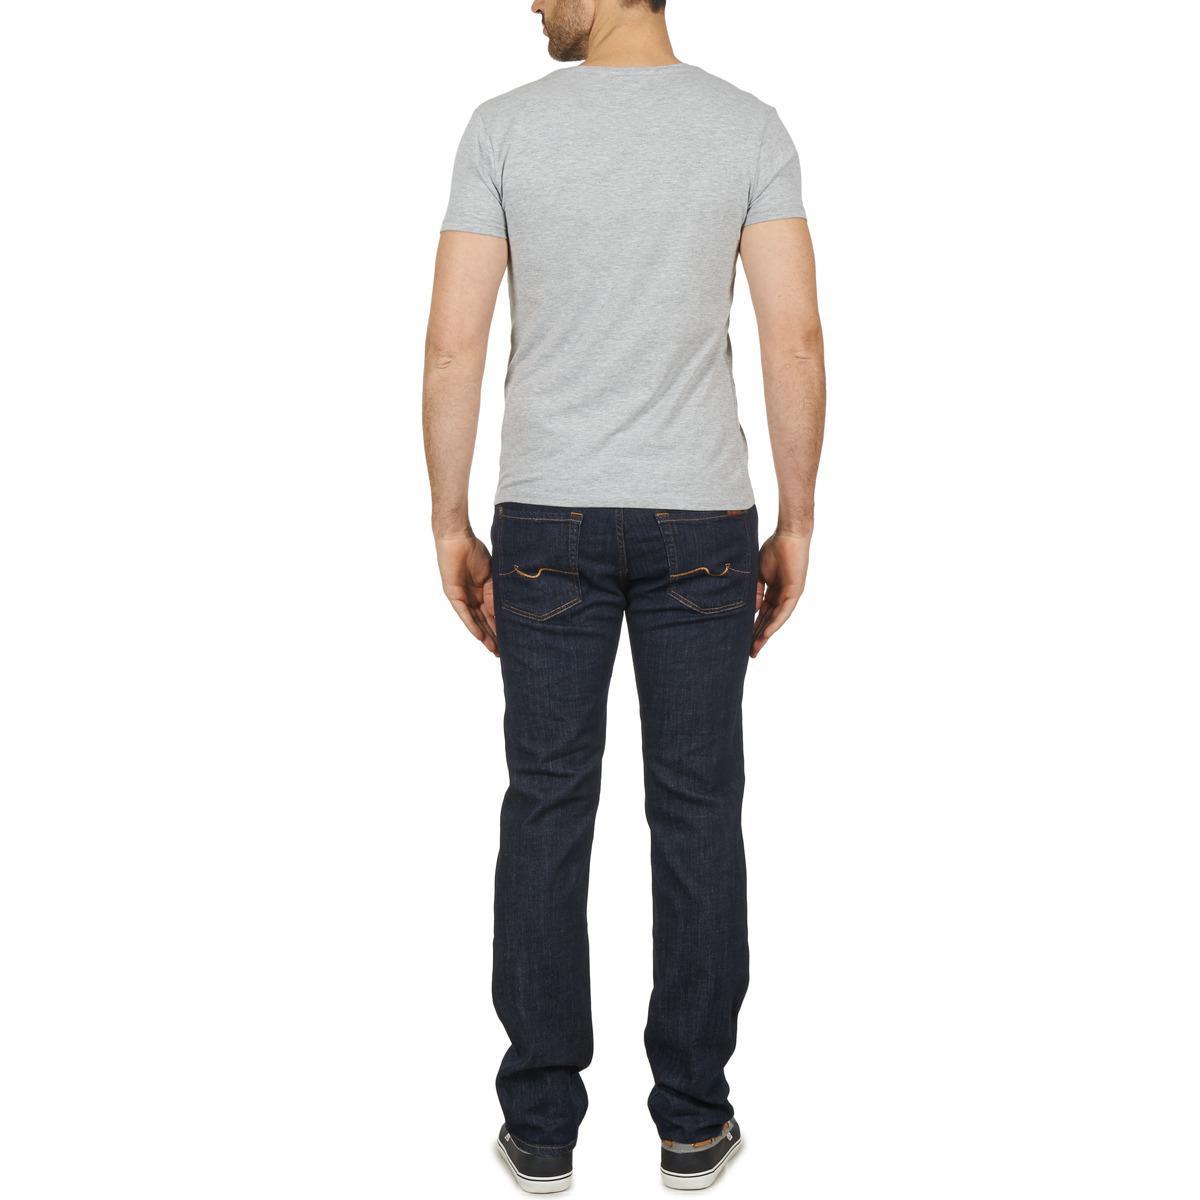 7 For All Mankind Denim Slimmy Oasis Tree Skinny Jeans in Blue for Men - Save 15%